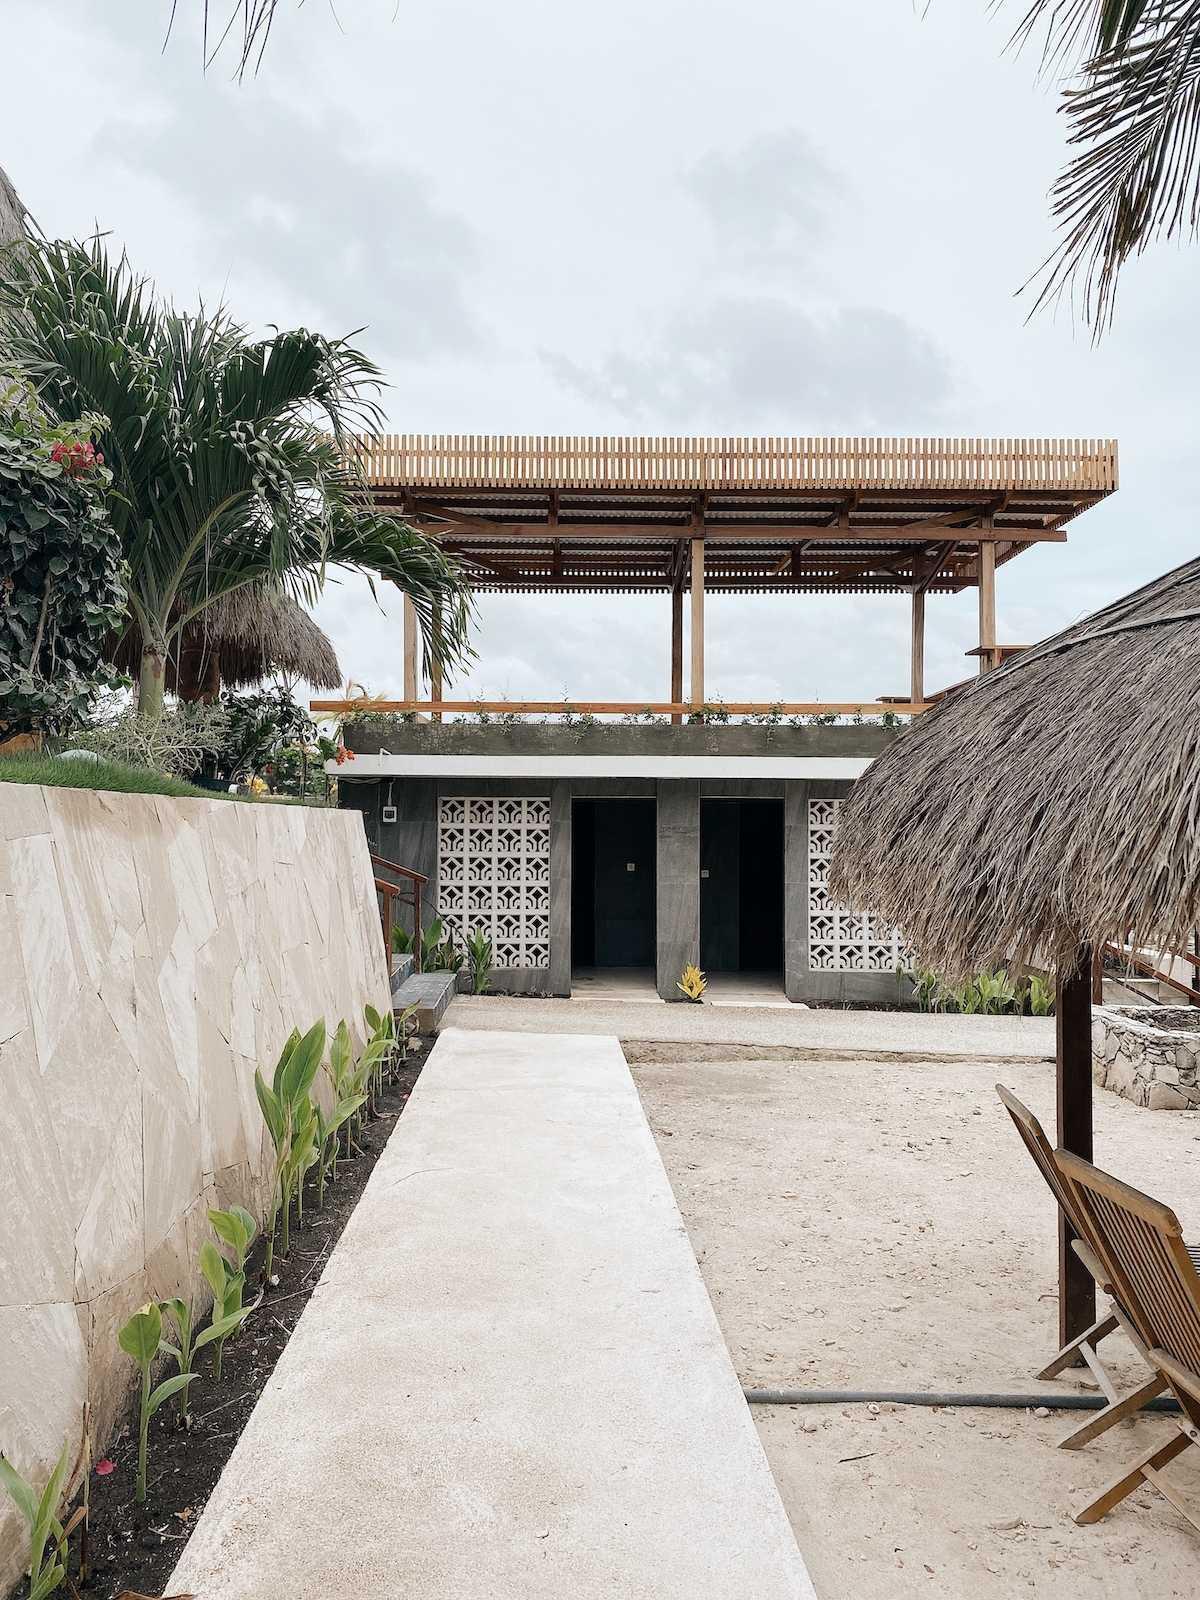 Studio Asri Sumba Beach Hotel Pulau Sumba, Nusa Tenggara Tim., Indonesia Pulau Sumba, Nusa Tenggara Tim., Indonesia Studio-Asri-Sumba-Beach-Hotel   107224